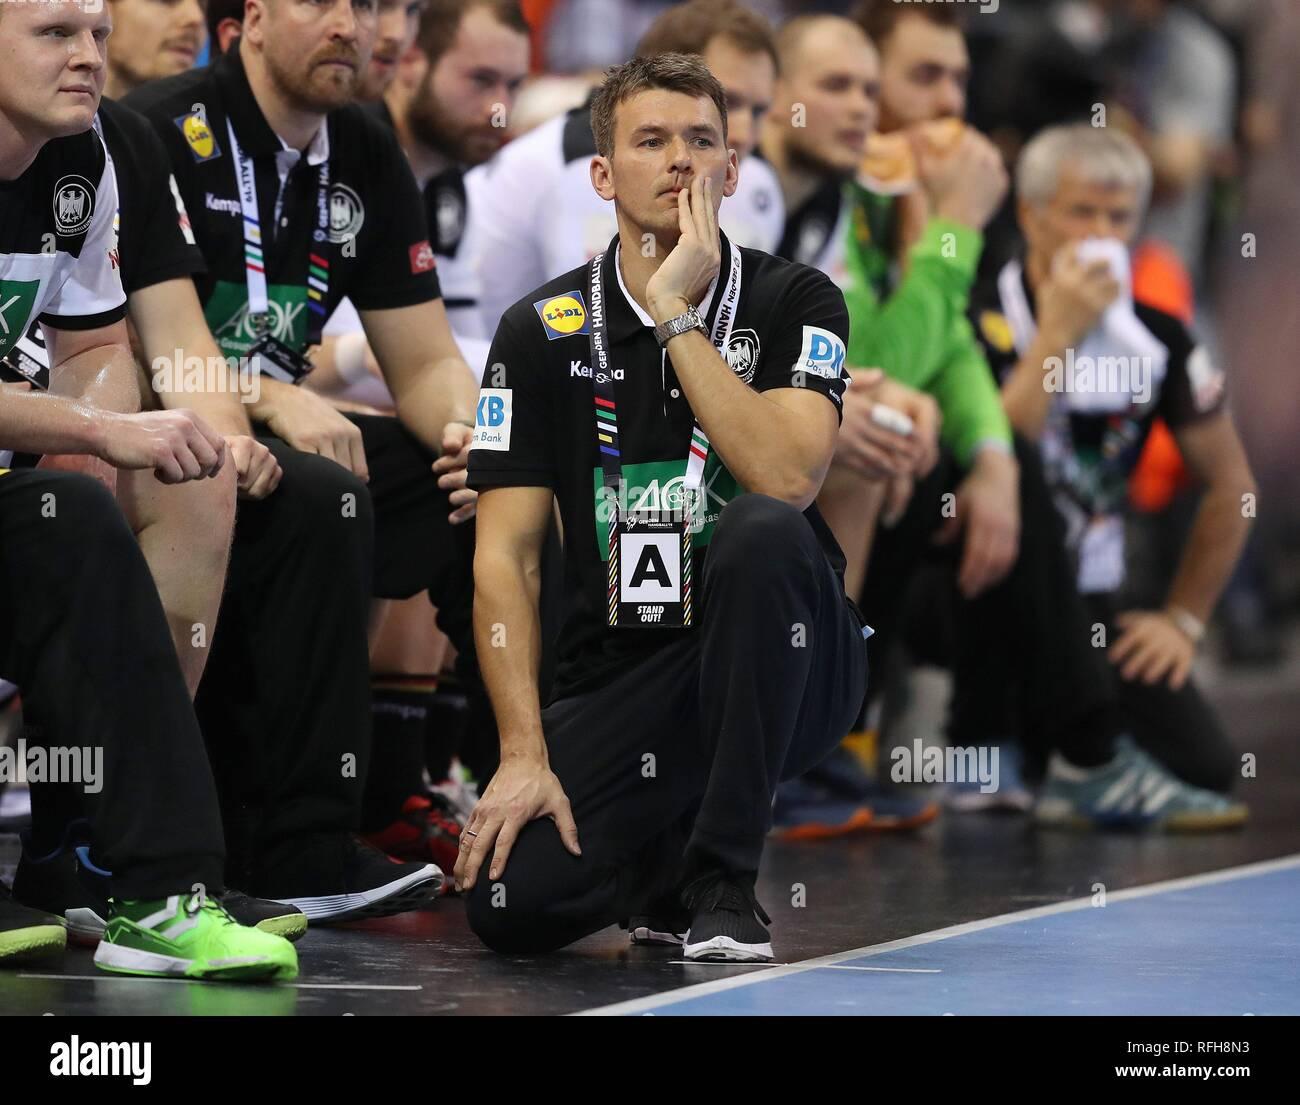 Hamburg, Deutschland. 25th Jan, 2019. firo: 25.01.2019, Handball: World Cup World Cup semi-finals Semi Final Germany - Norway gesture, Christian Prokop | usage worldwide Credit: dpa/Alamy Live News Stock Photo